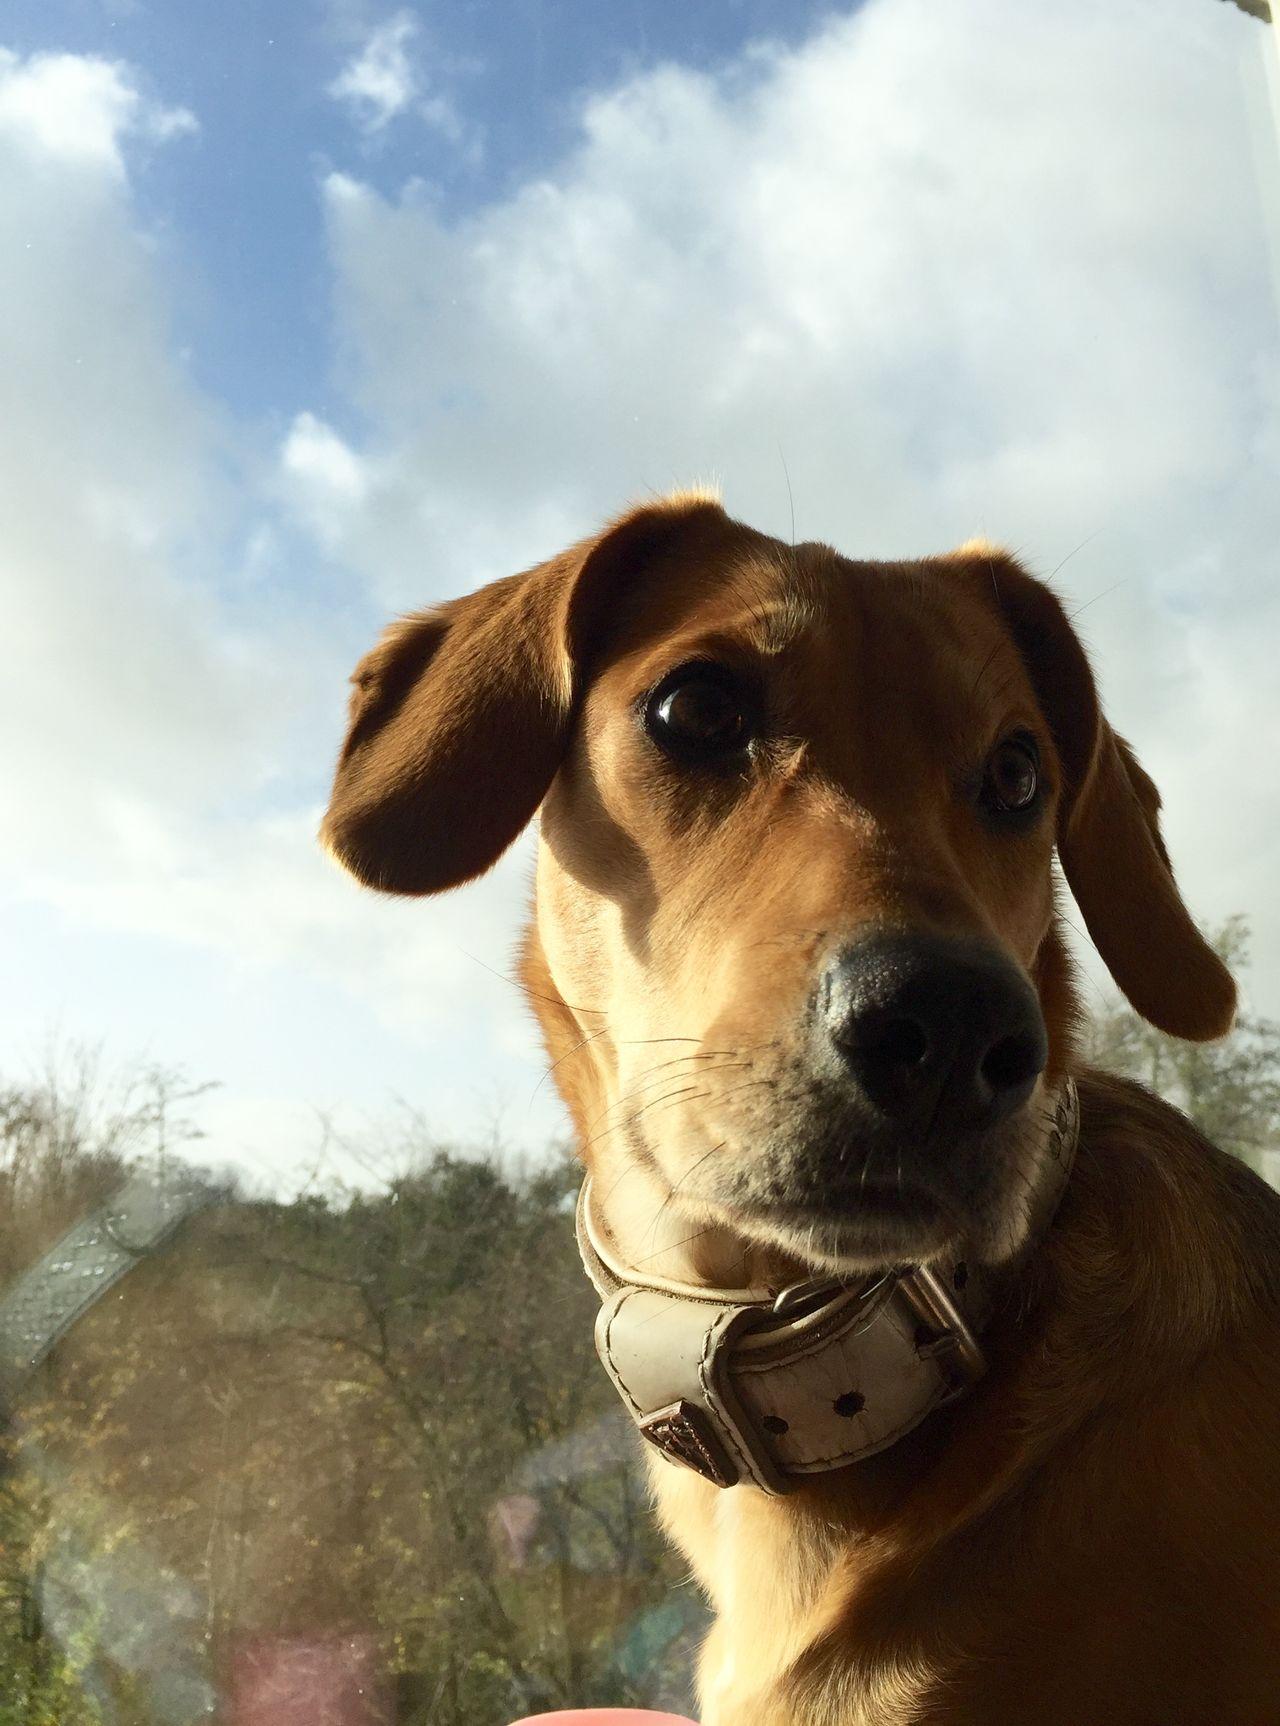 Showcase: November Hollandsnextdogmodel My Dog Clouds And Sky Cloudporn Cute Pets EyeEm Animal Lover Window Eyem Gallery IPhoneography